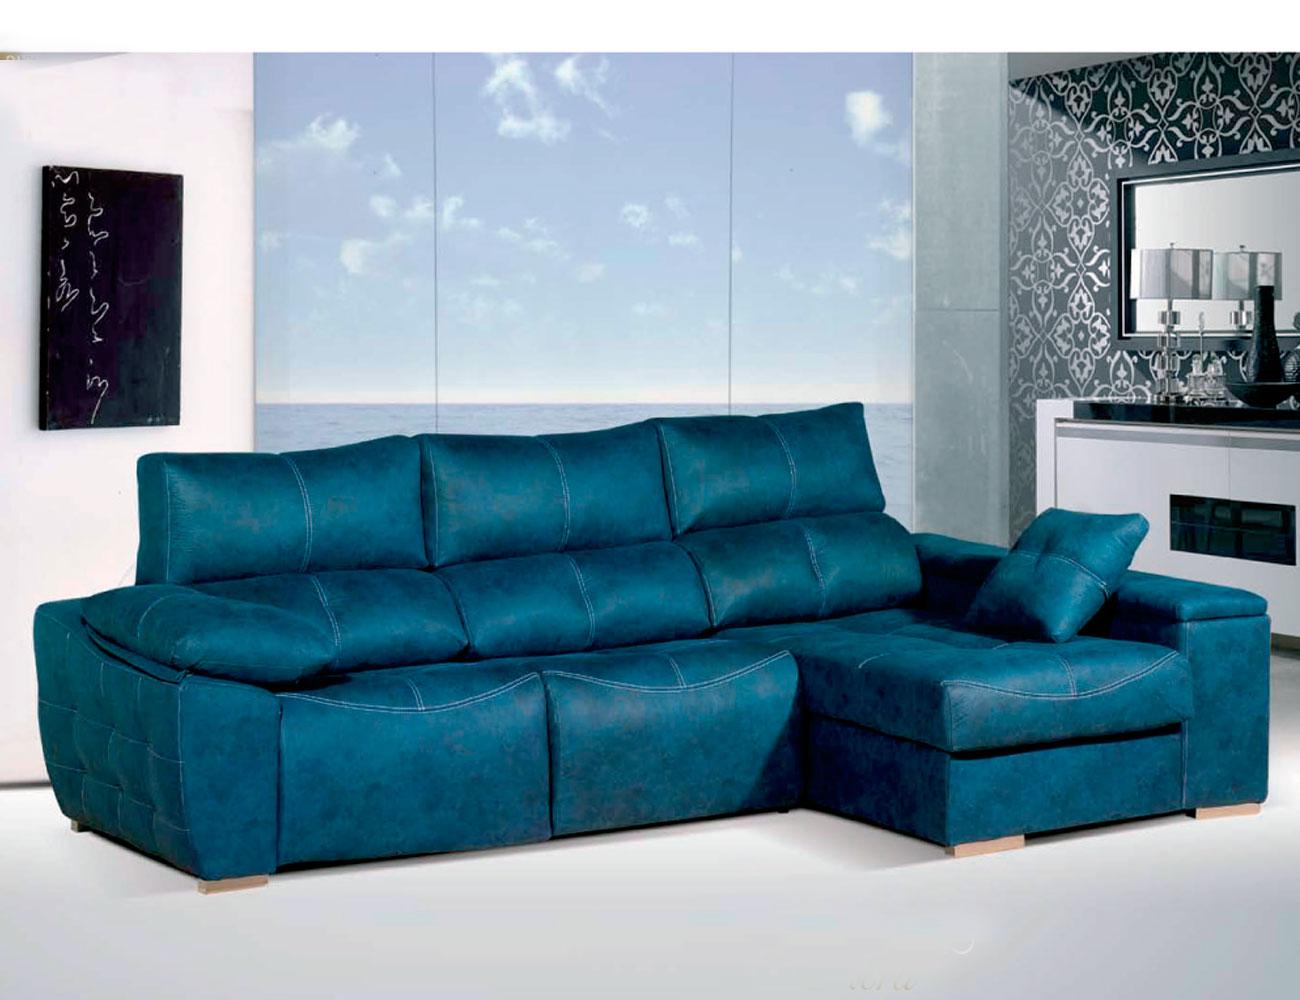 Sofa chaiselongue relax 2 motores anti manchas turquesa16